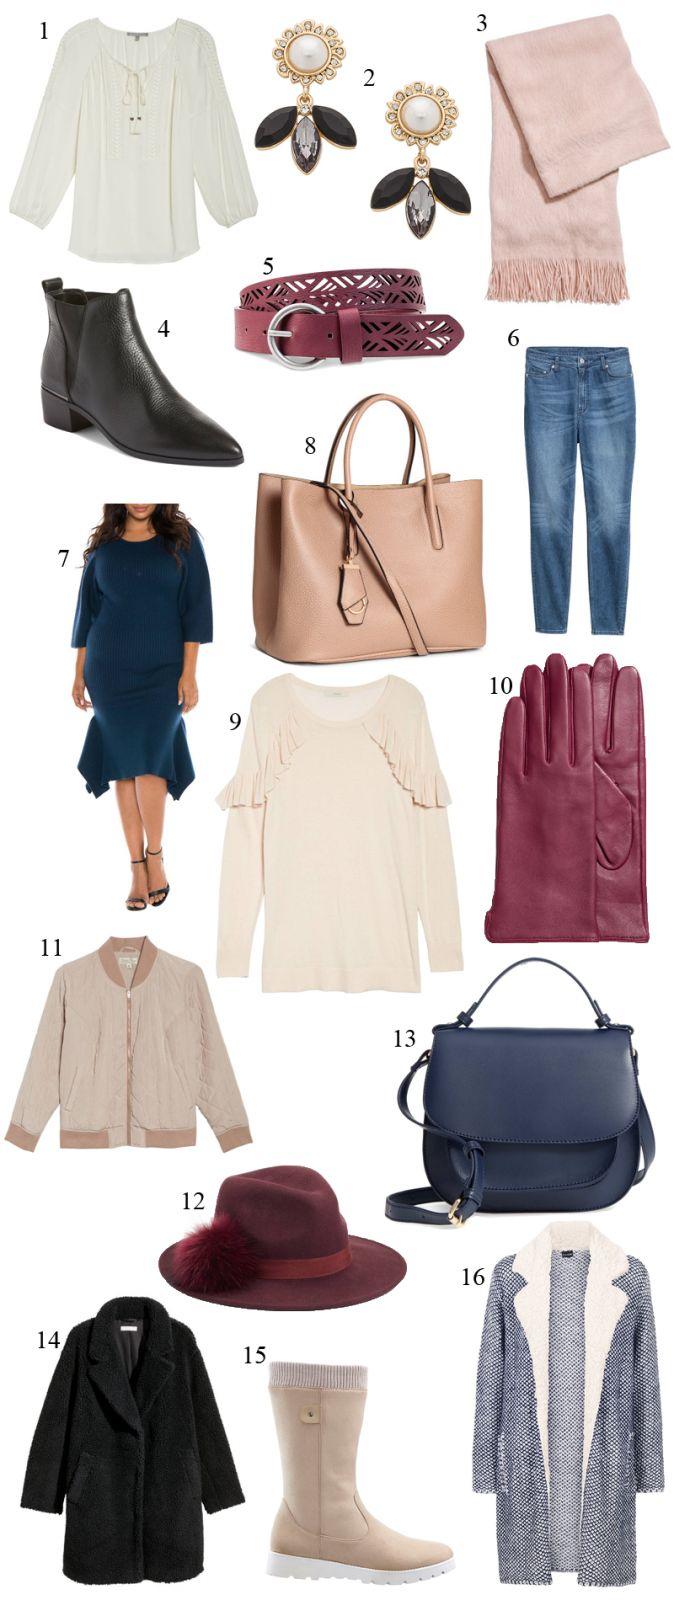 Late Fall Plus Size Fashion Picks Under 100 €